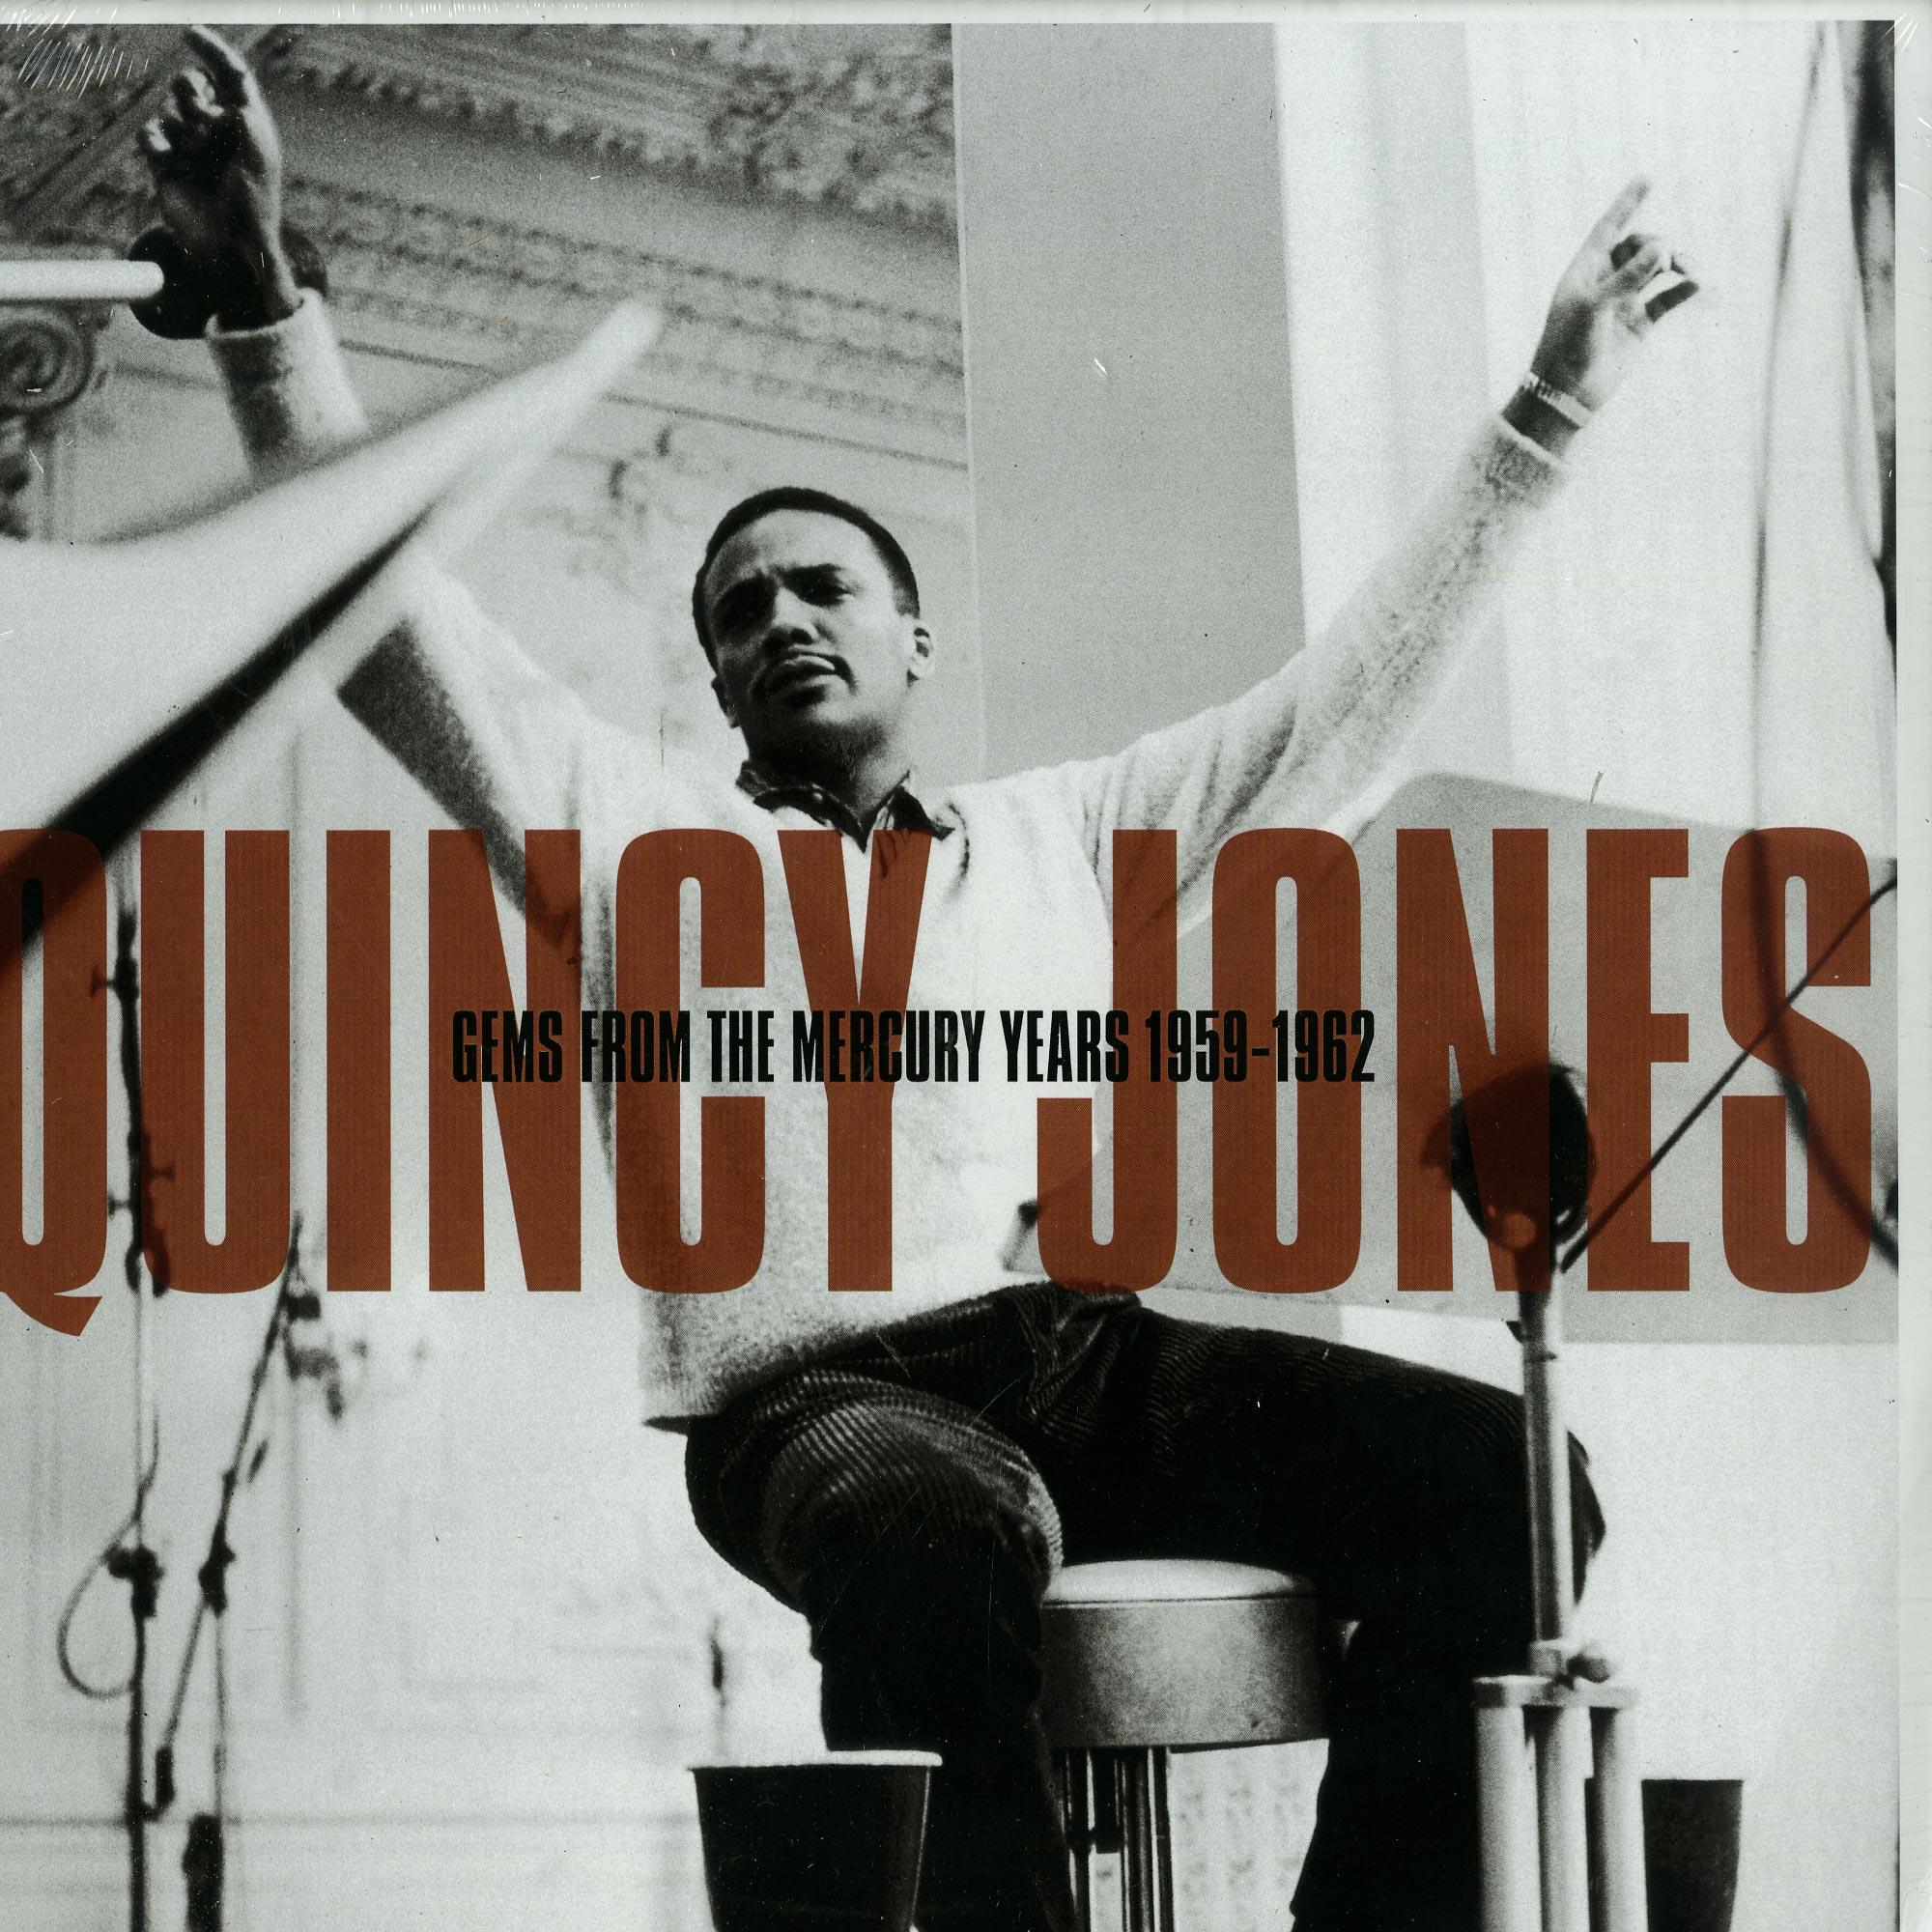 Quincy Jones - GEMS FROM THE MERCURY YEARS 1959 - 1962